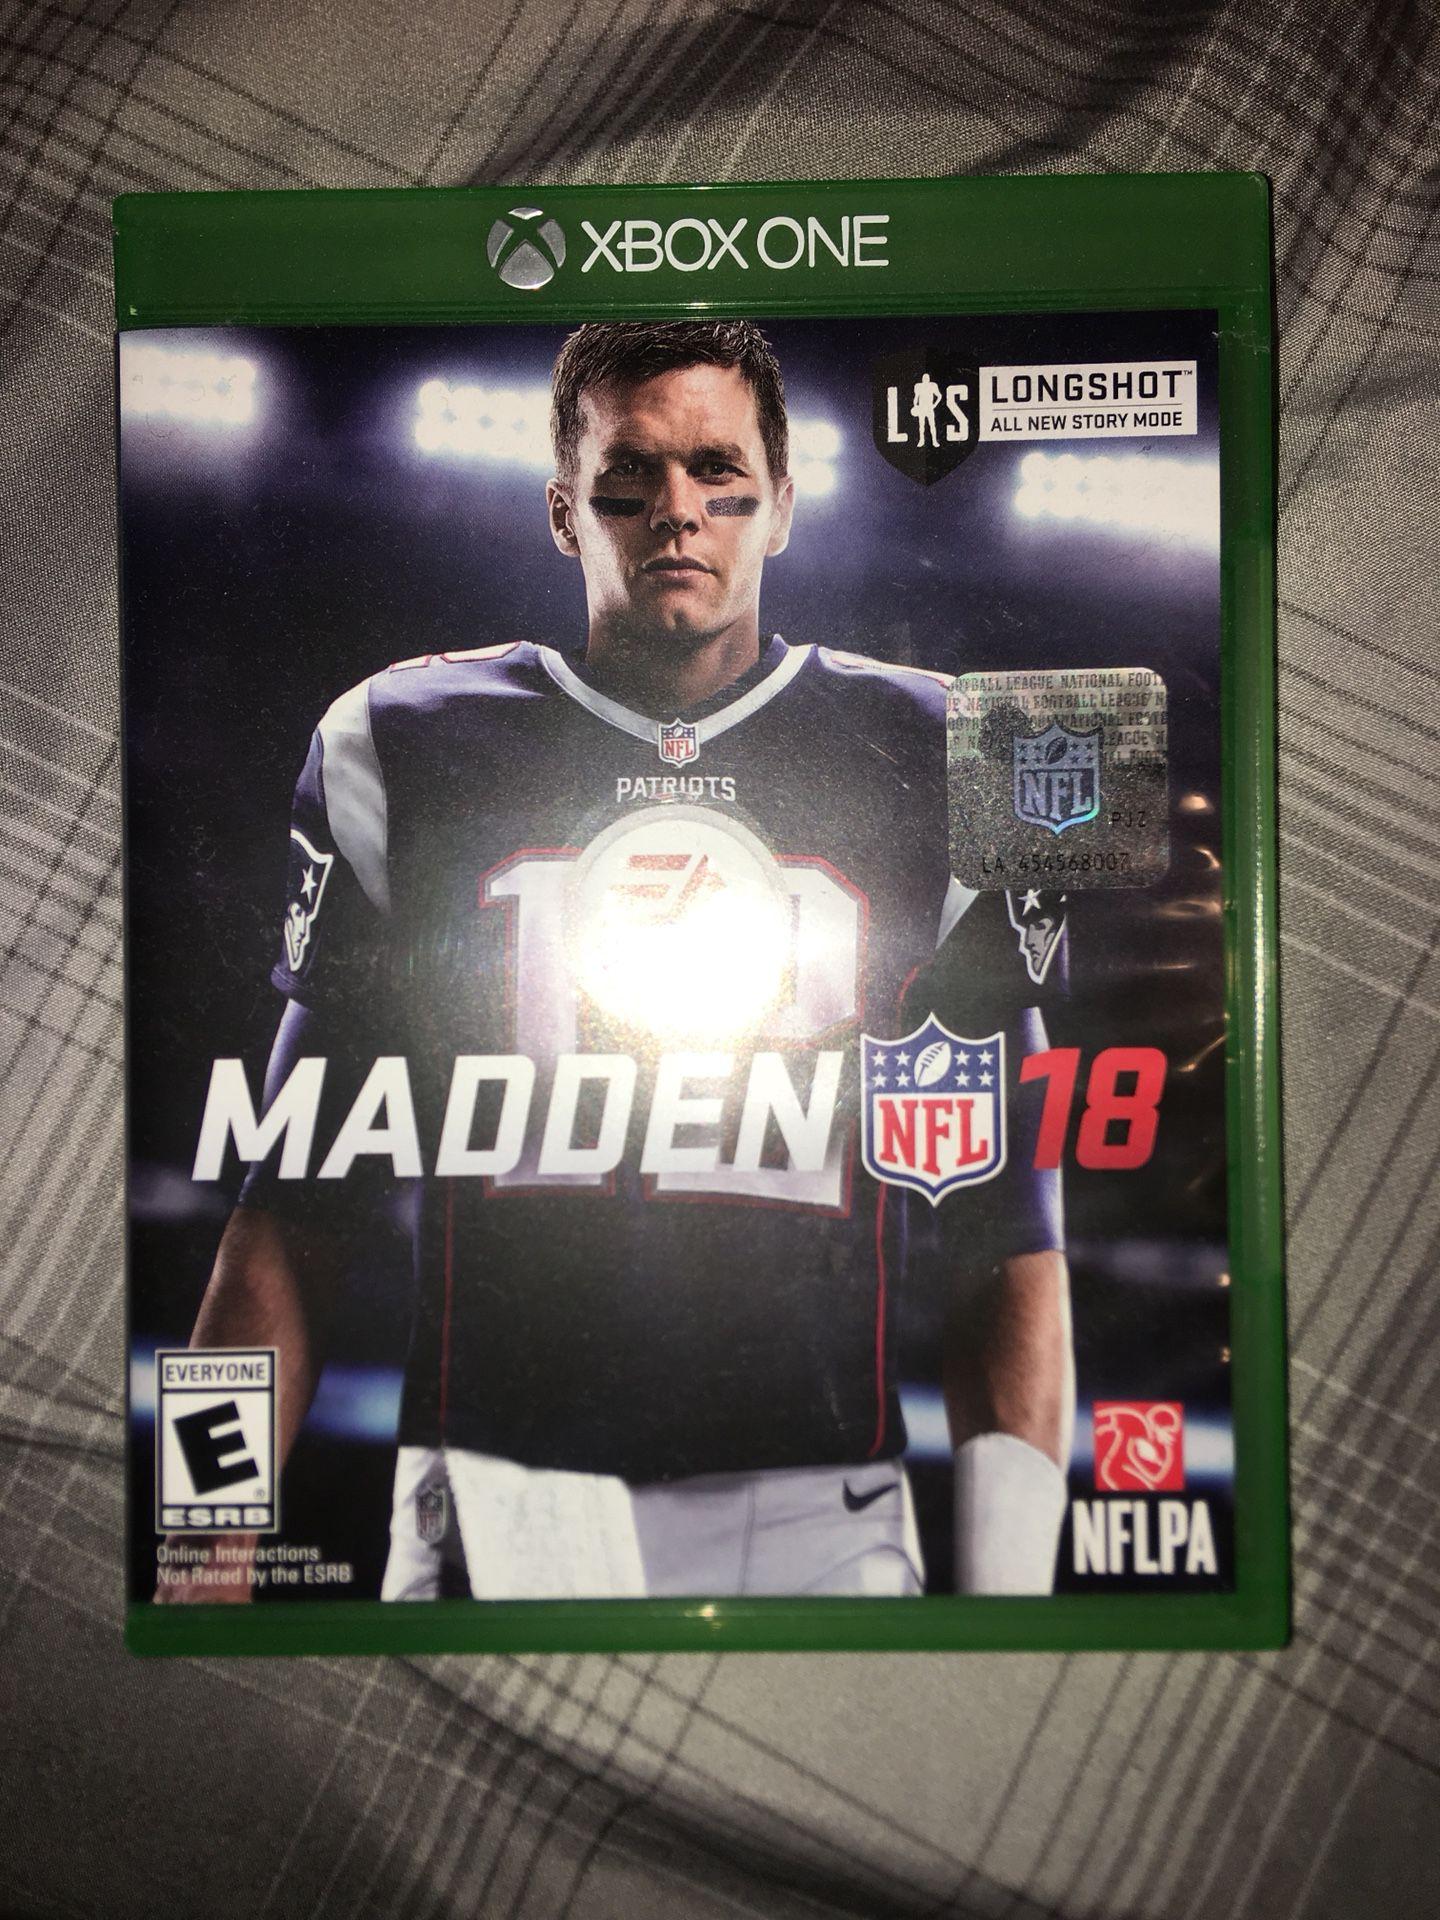 Xbox madden 18